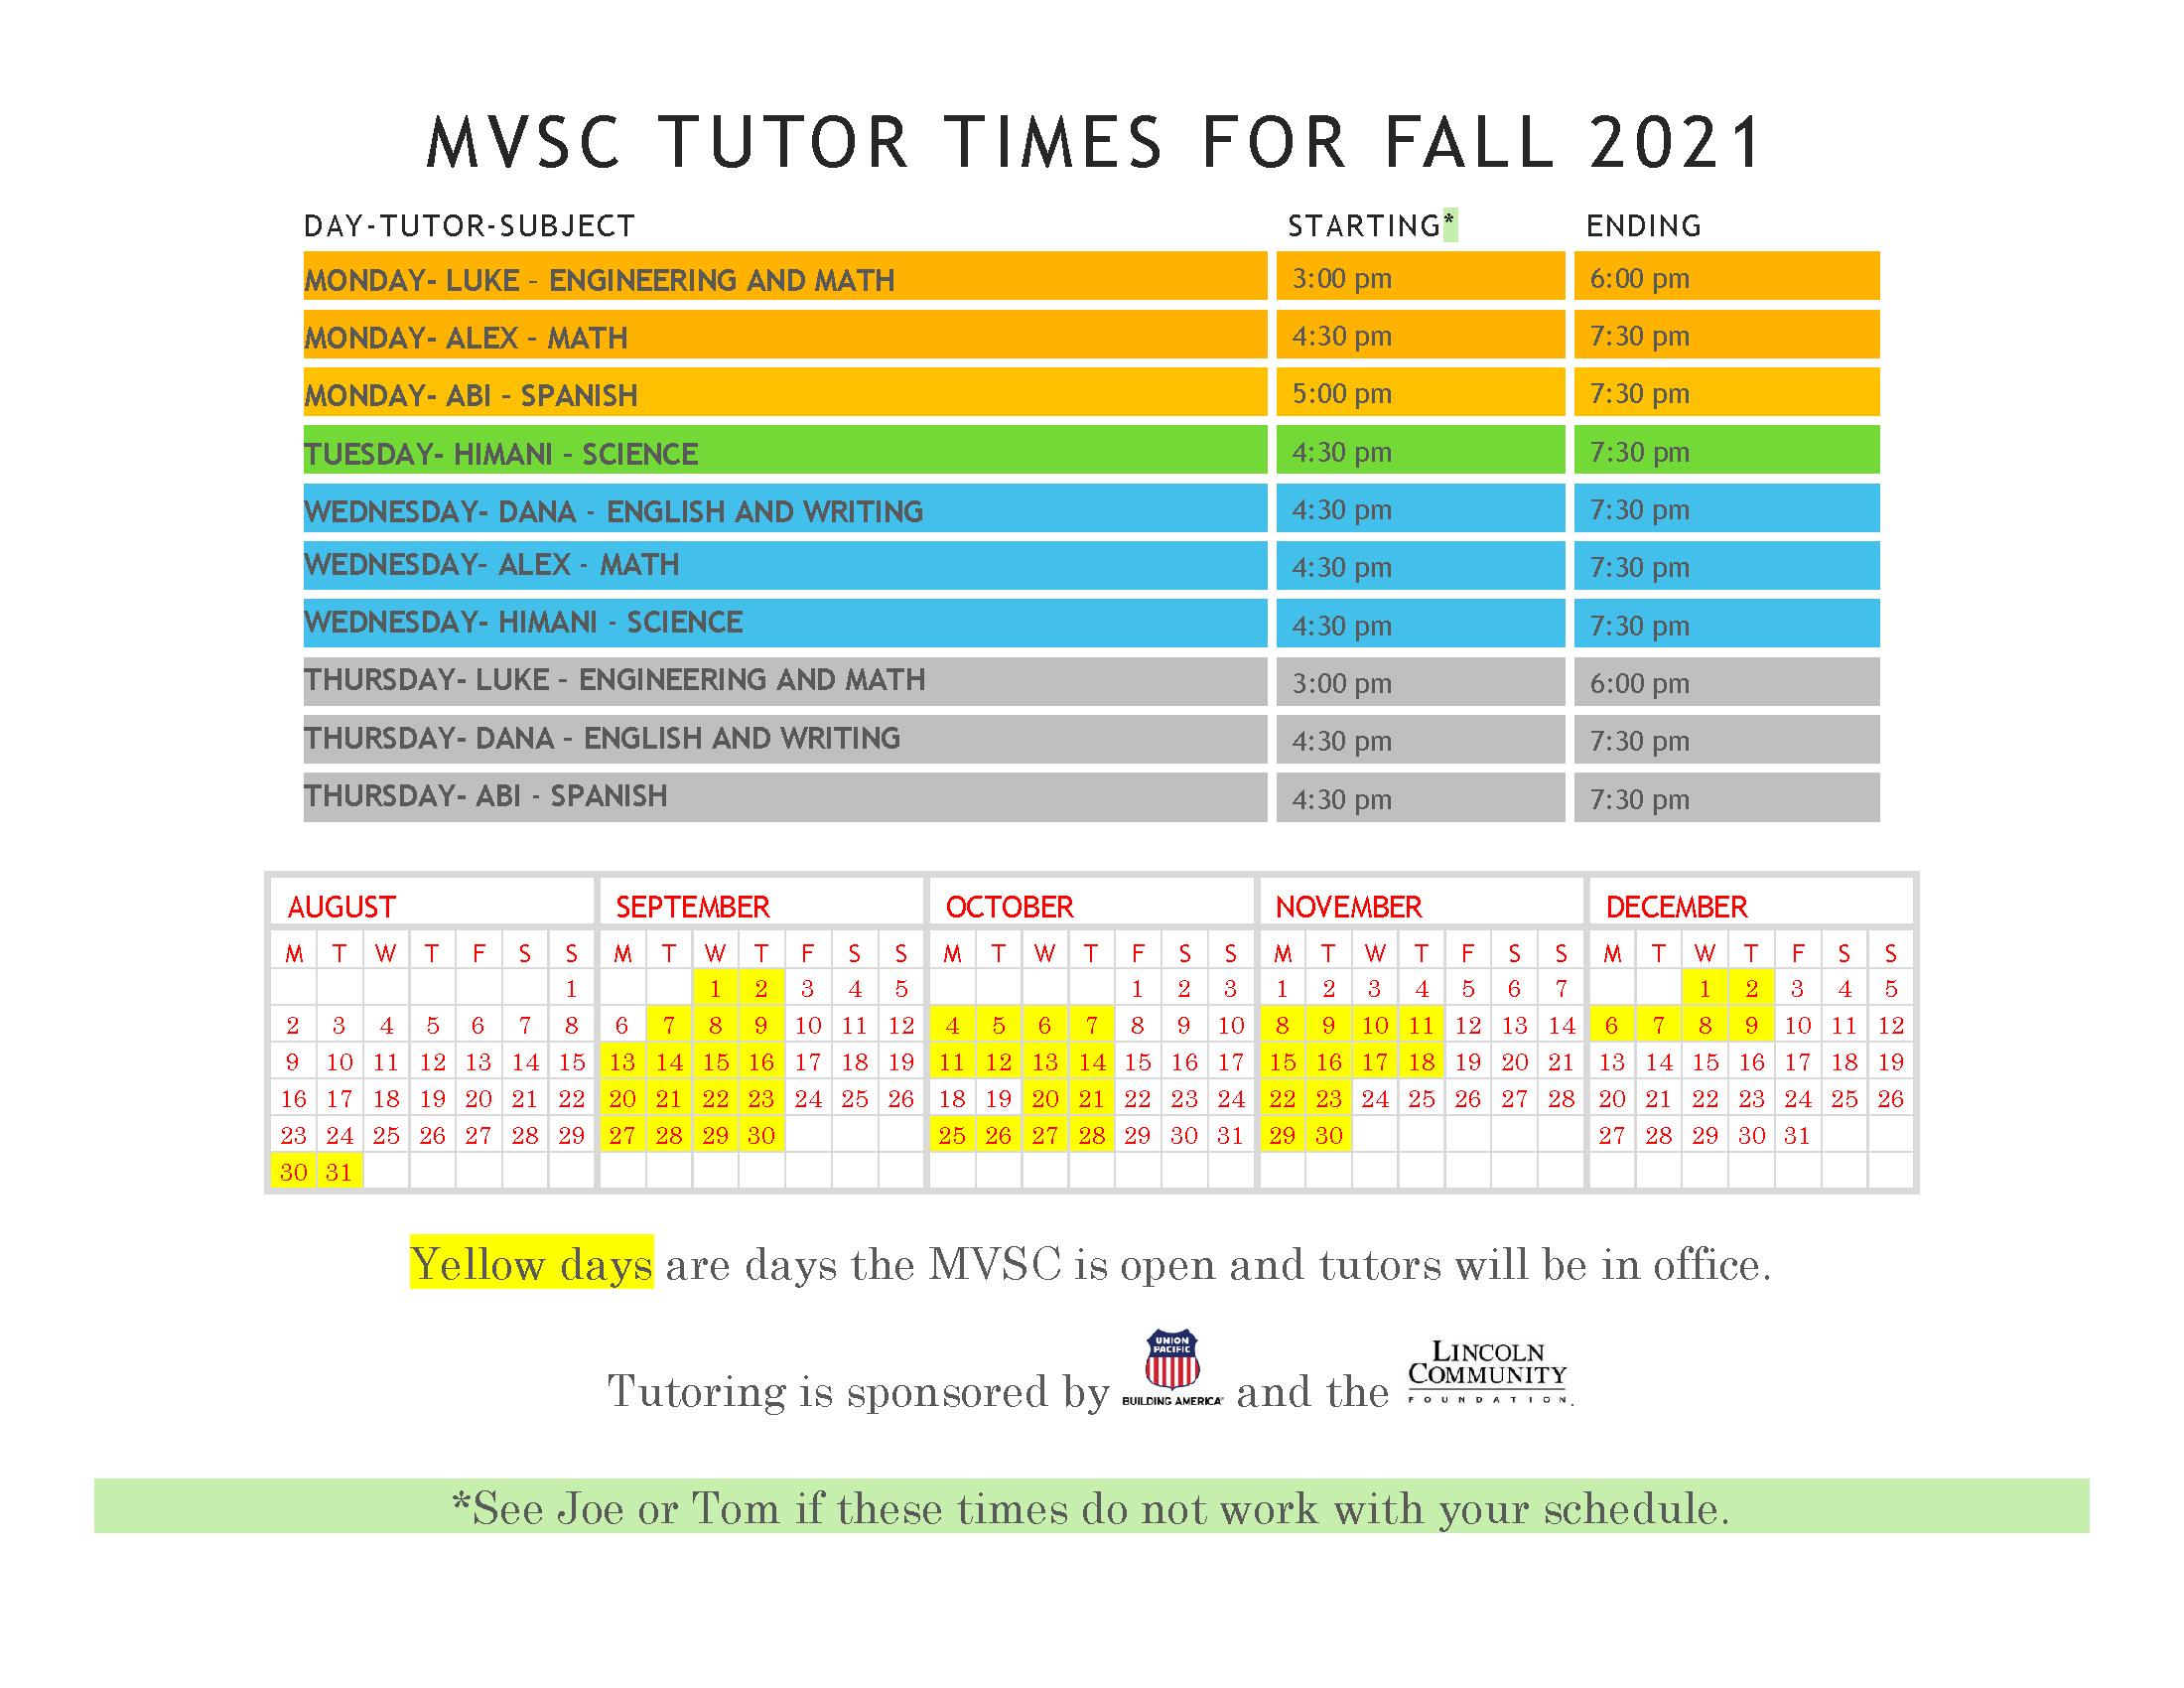 MVSC Tutor Times for Fall